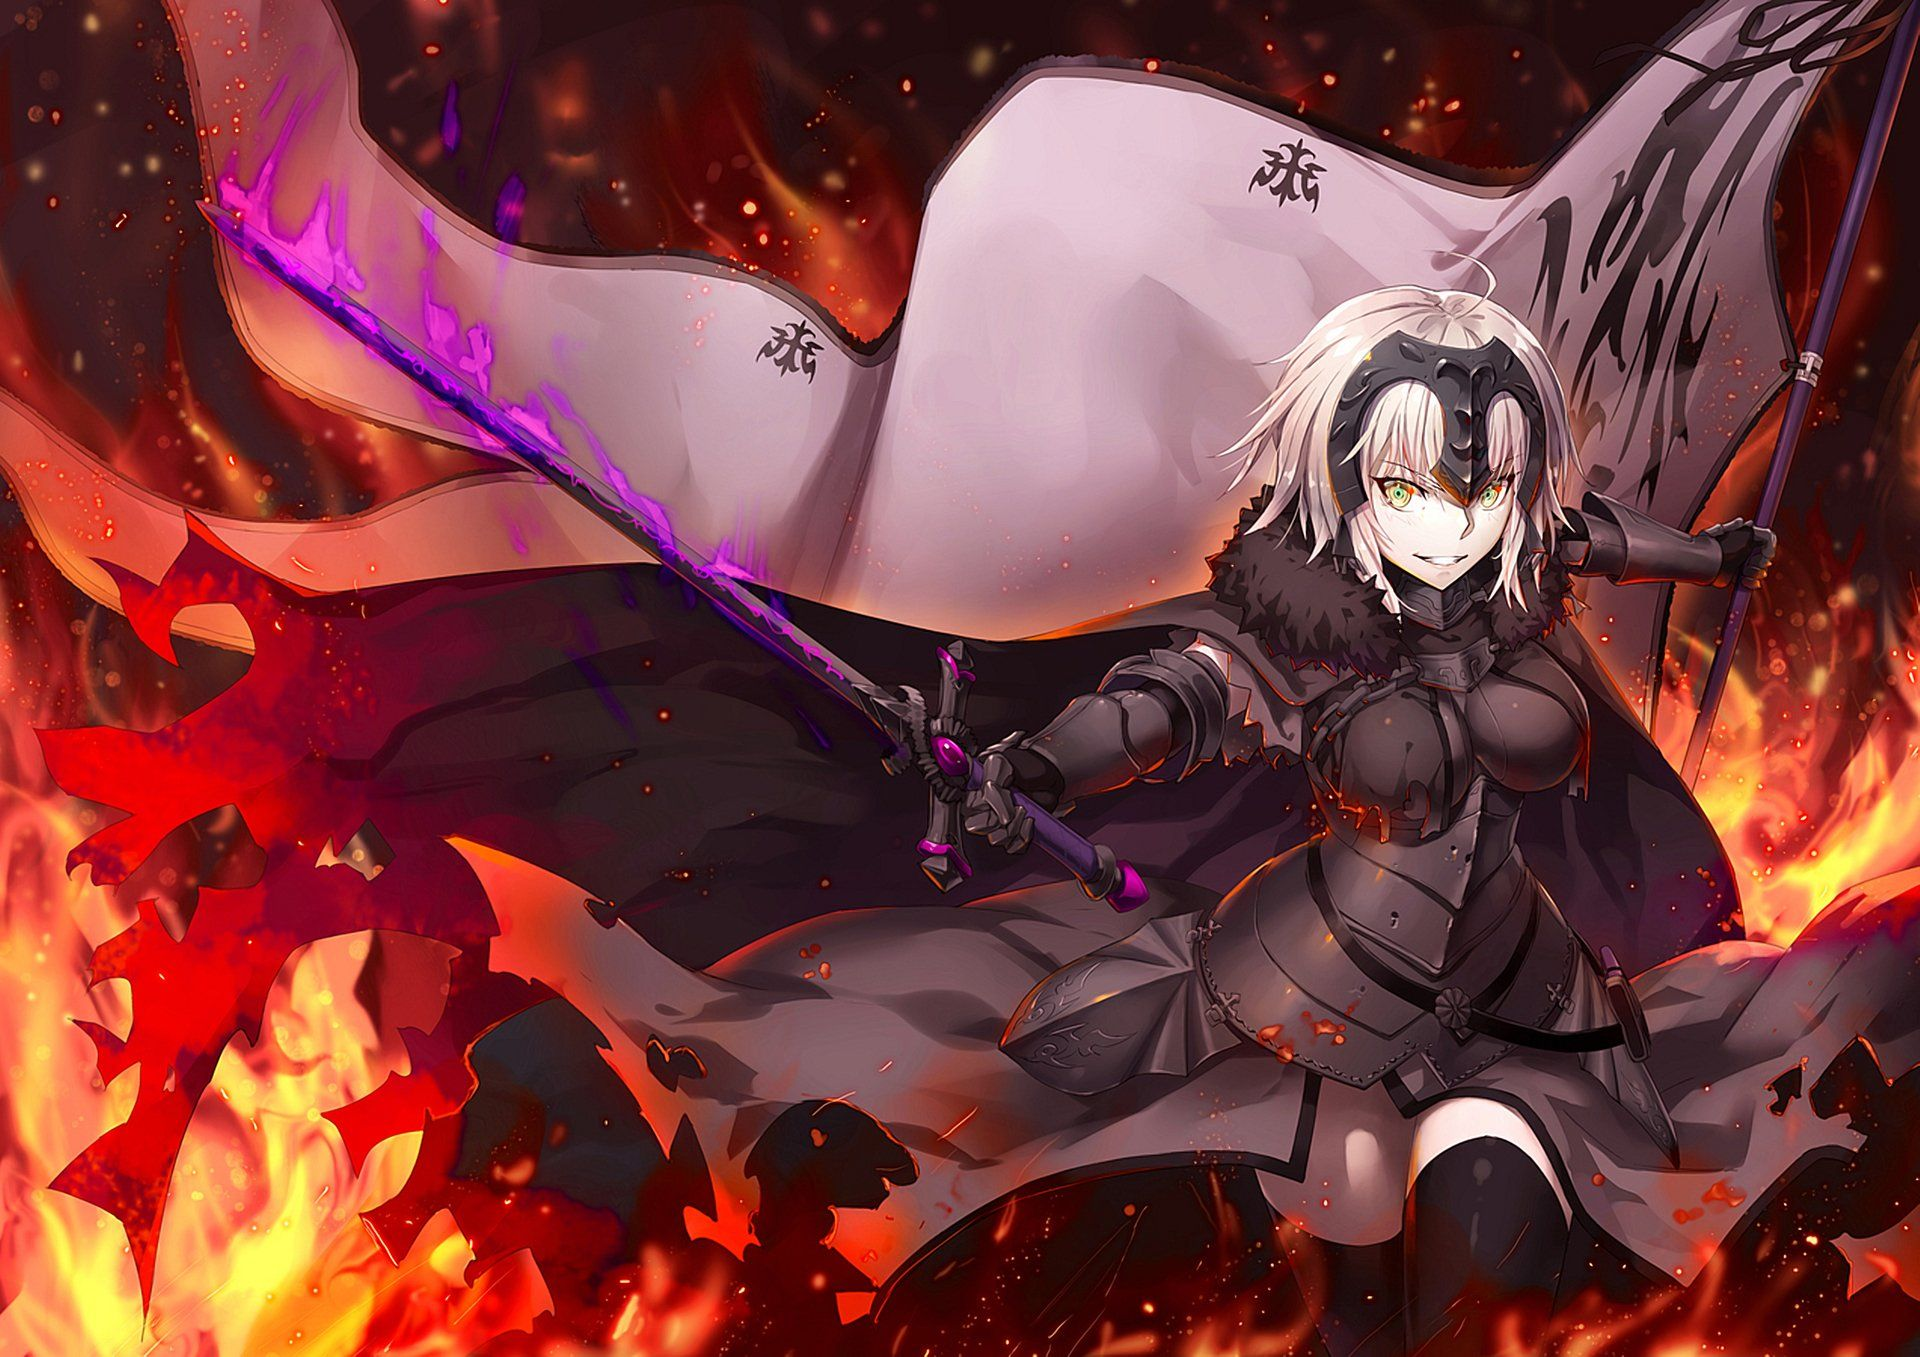 Anime Fate Grand Order Jeanne D Arc Alter Wallpaper Joan Of Arc Fate Anime Jeanne D Arc